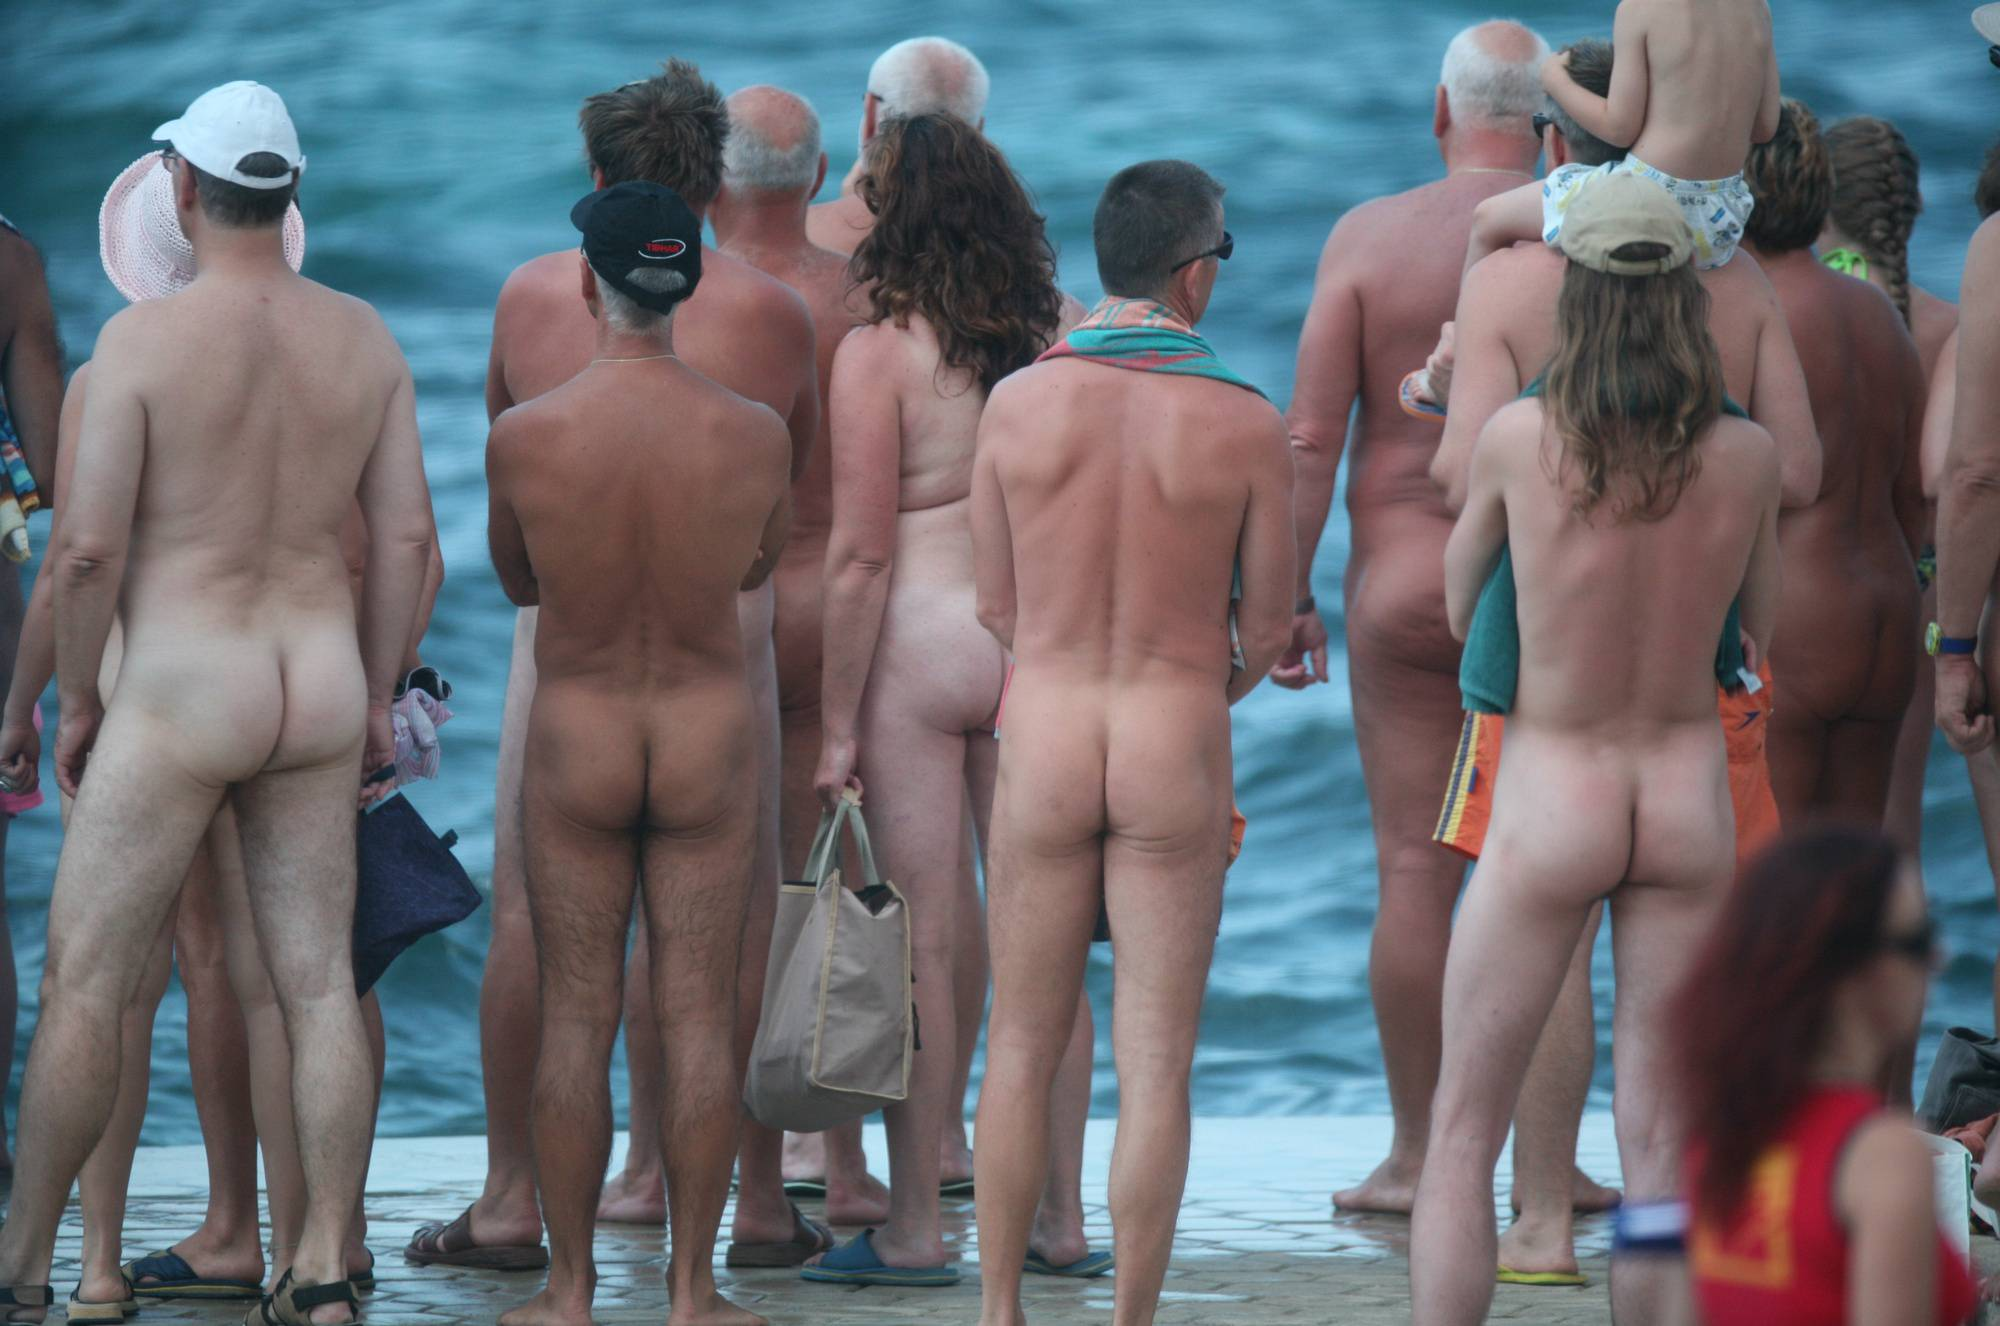 Nudist Pics Pier Sand Square Group - 2